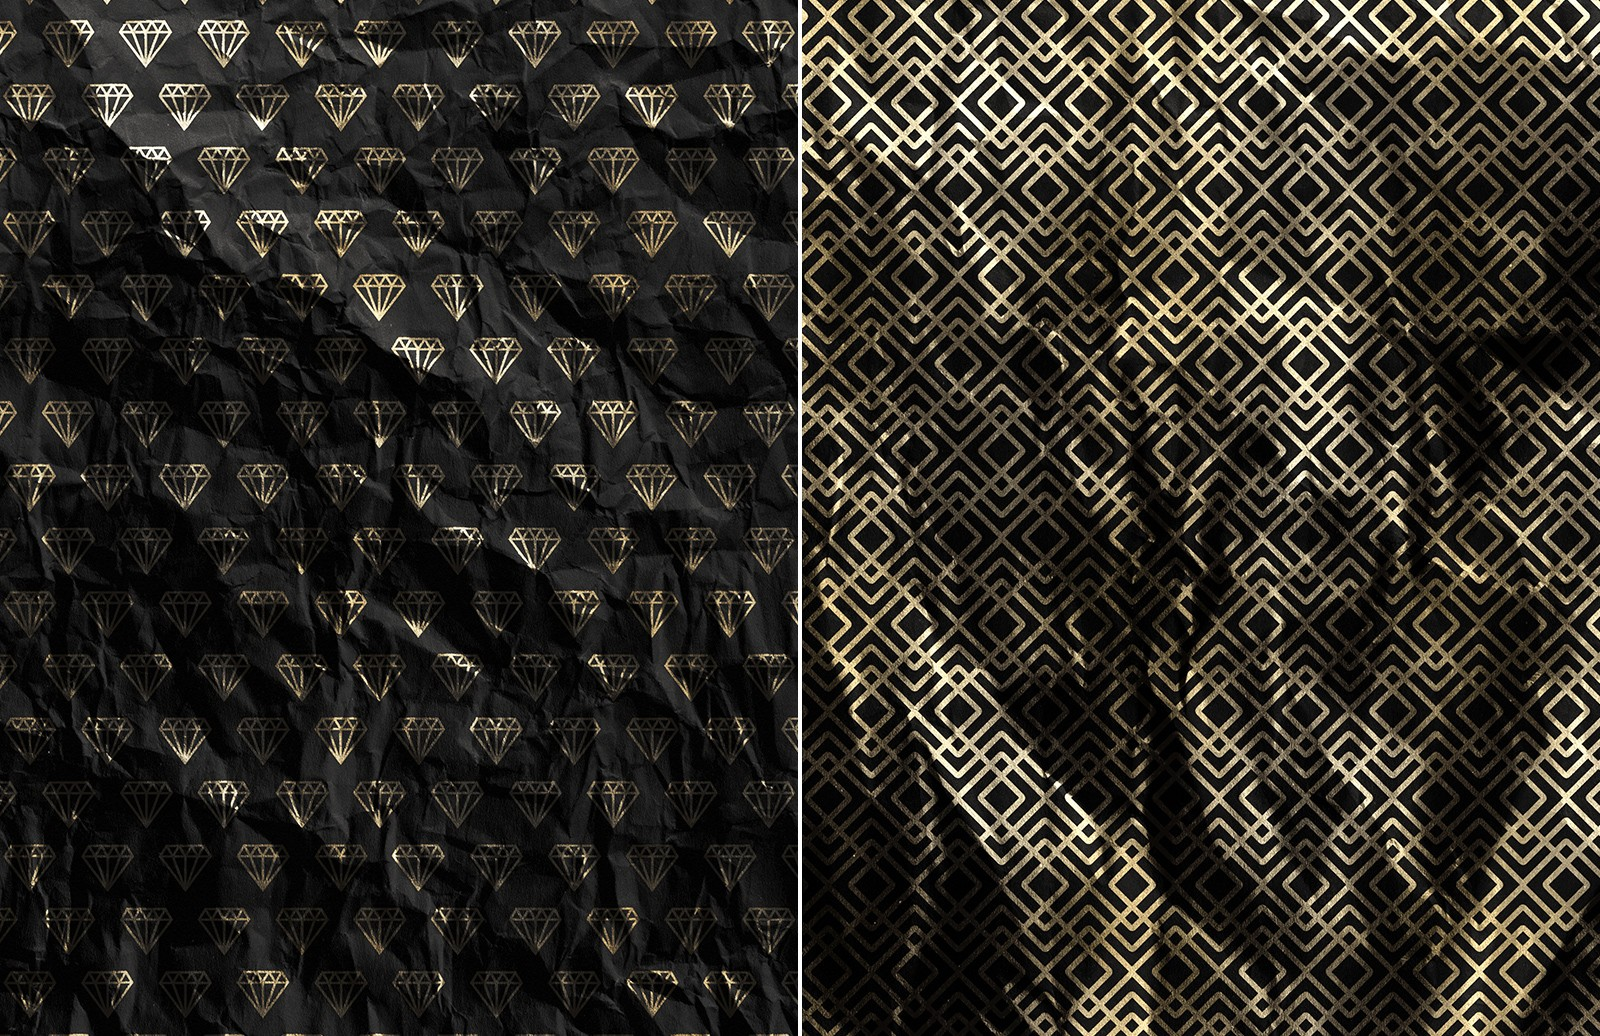 Gold  Foil  Paper  Textures  Preview 6